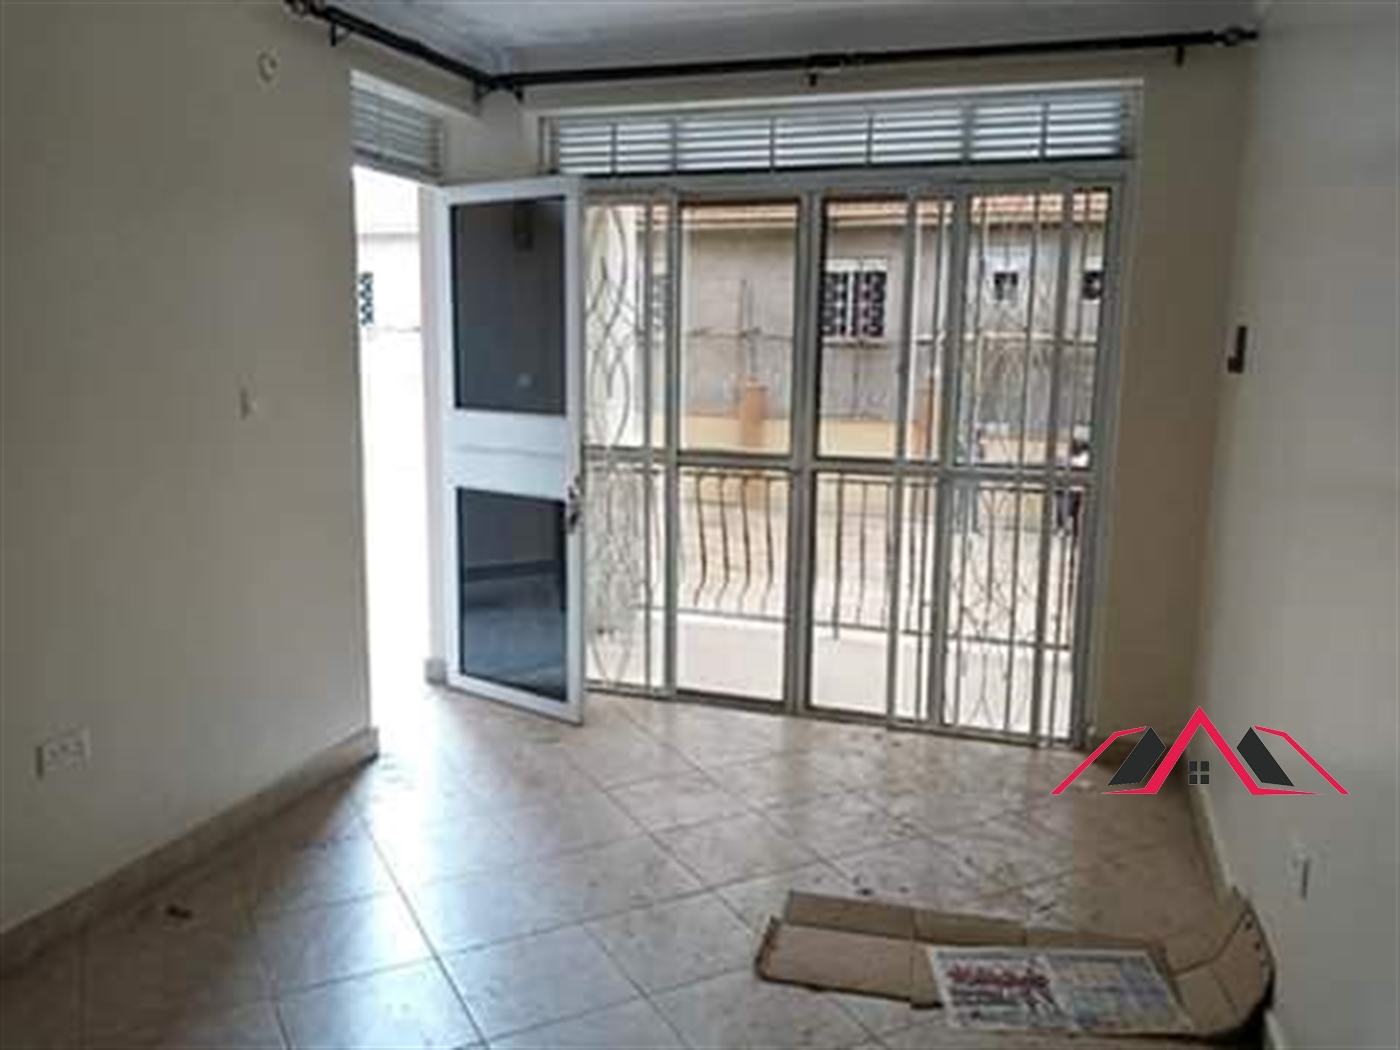 Apartment for rent in Kyaliwajja Kampala